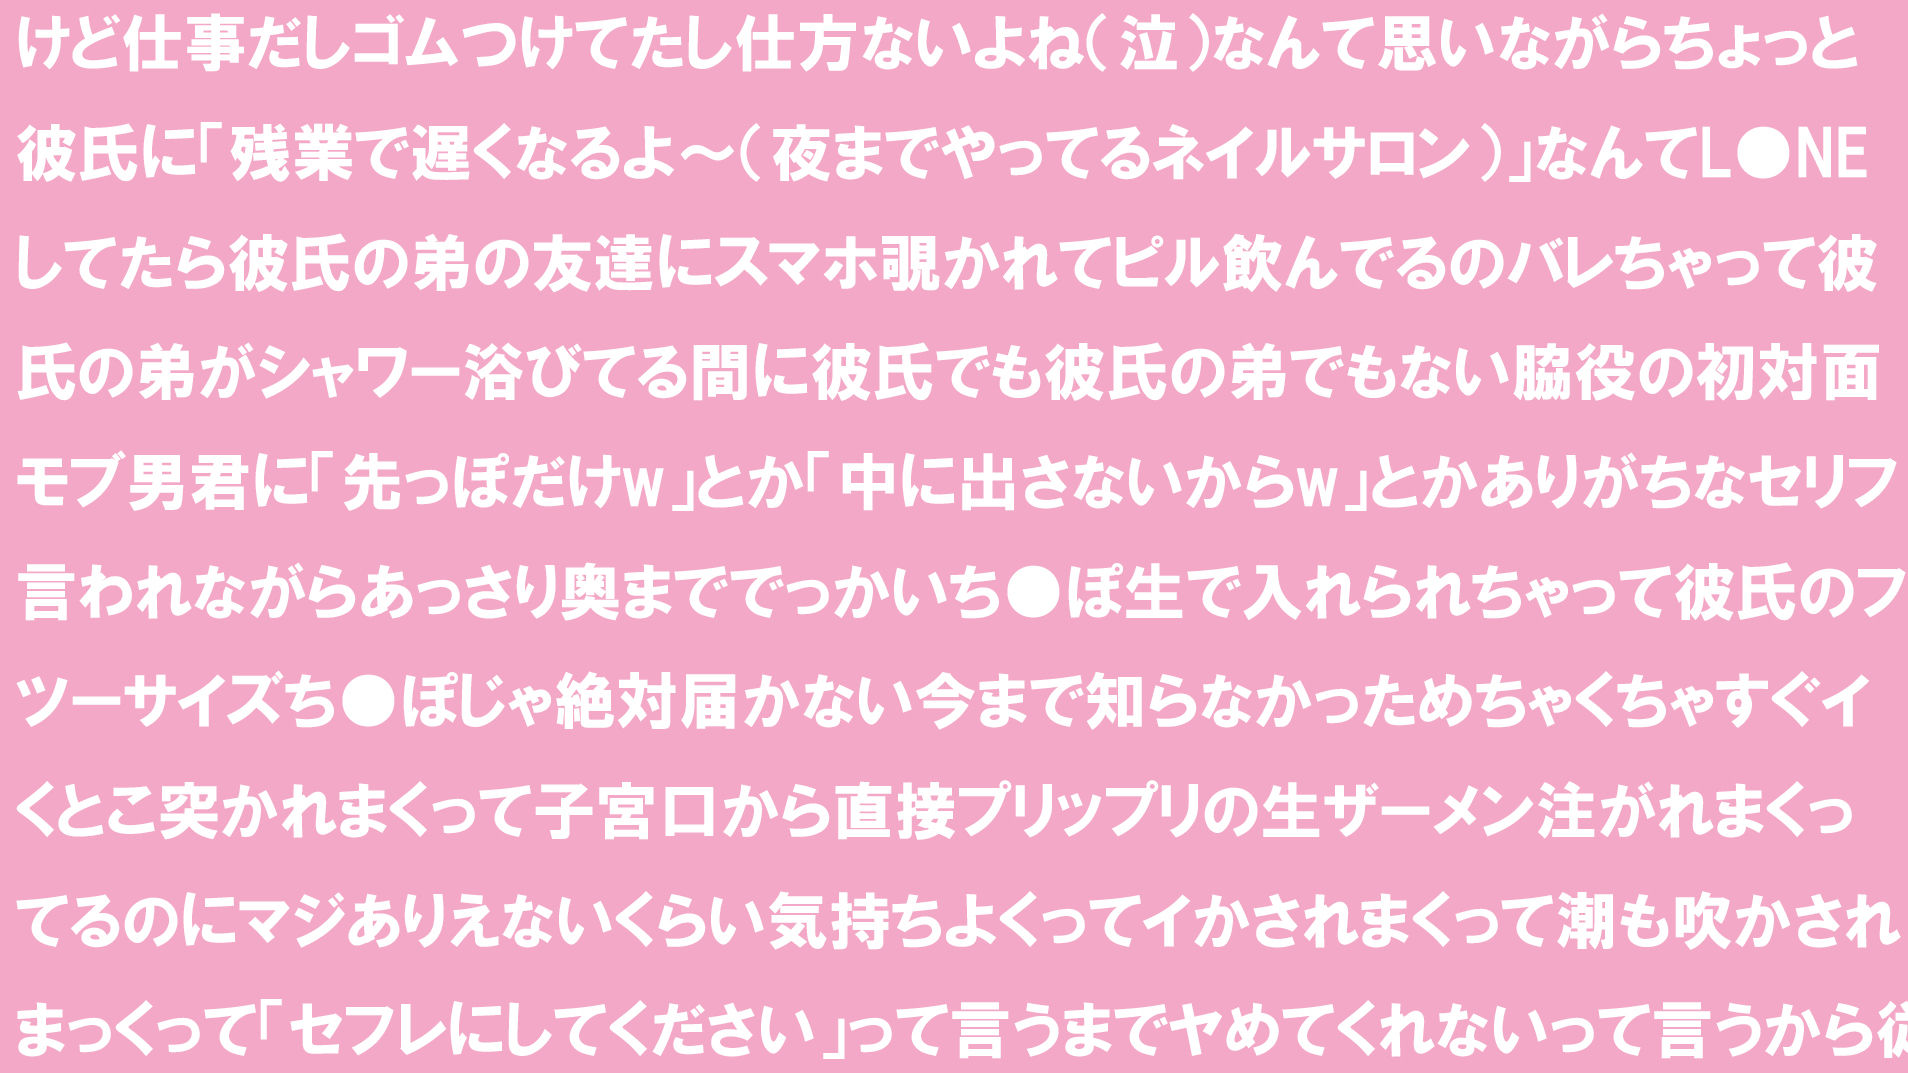 �ǥ�إ�Ƥ���顢������������褿���顢����㤯����S��X���� 1.5 ����